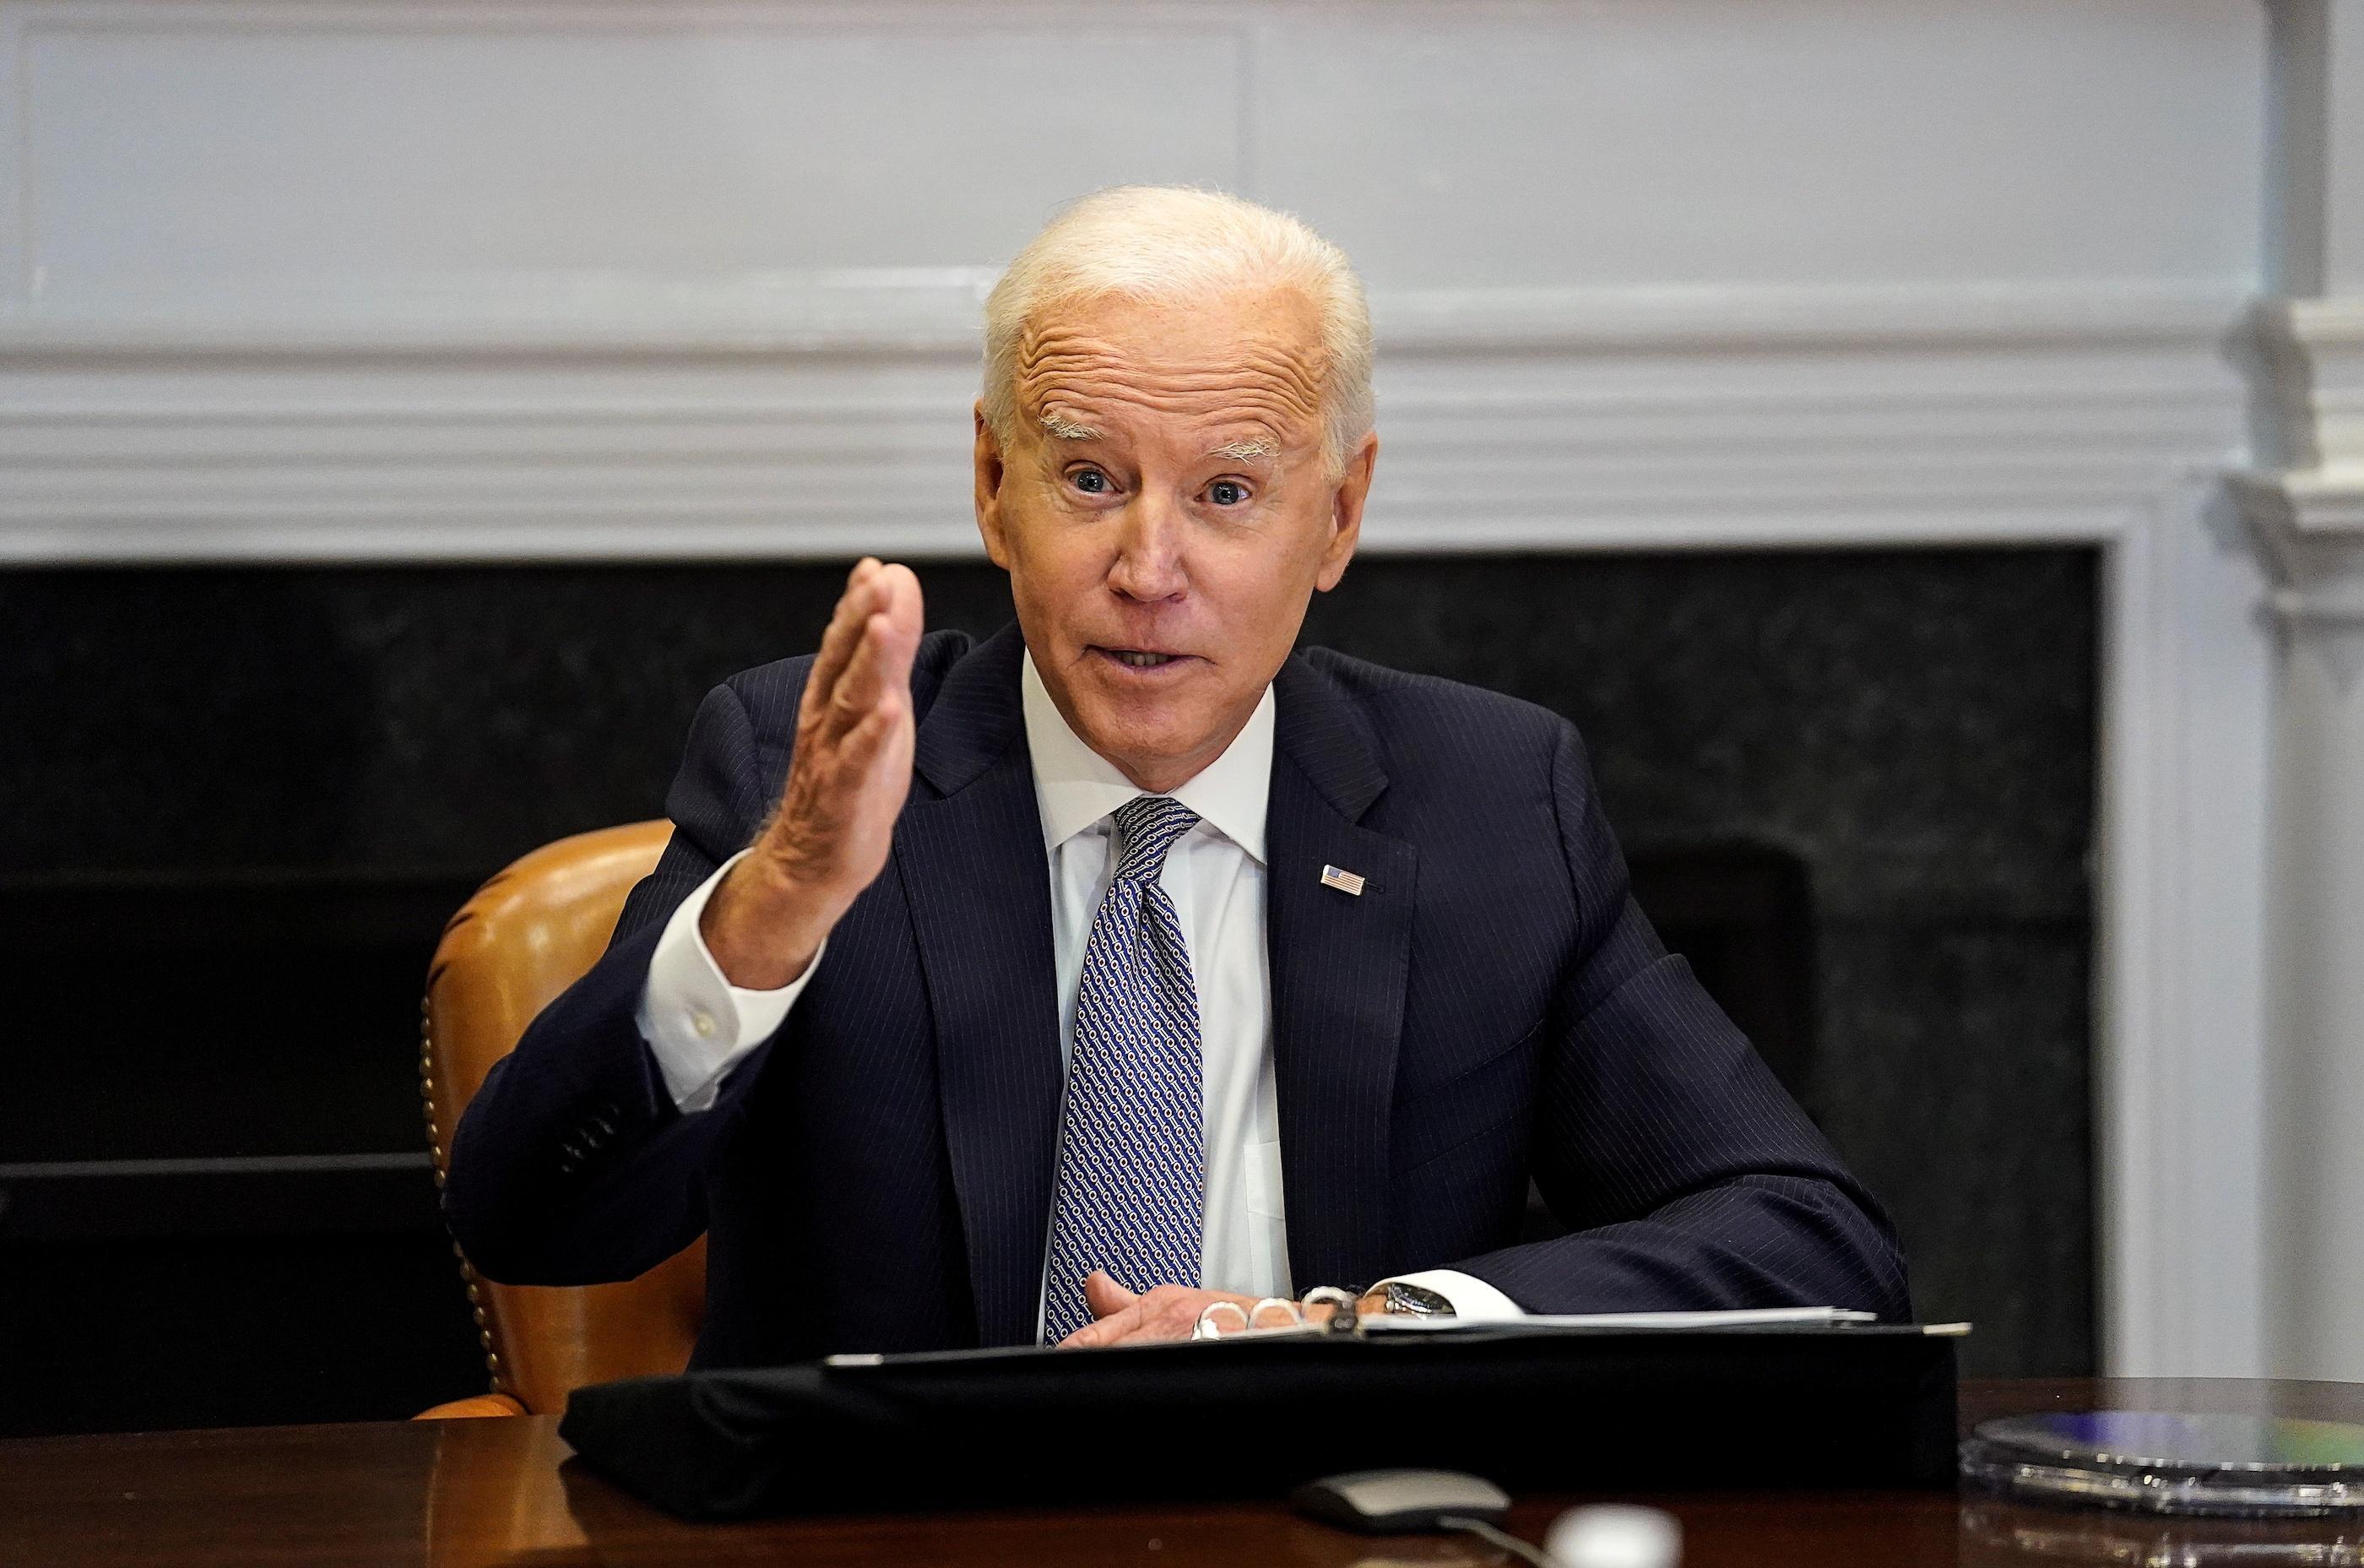 Dems make progress on Biden agenda, but deal may take time